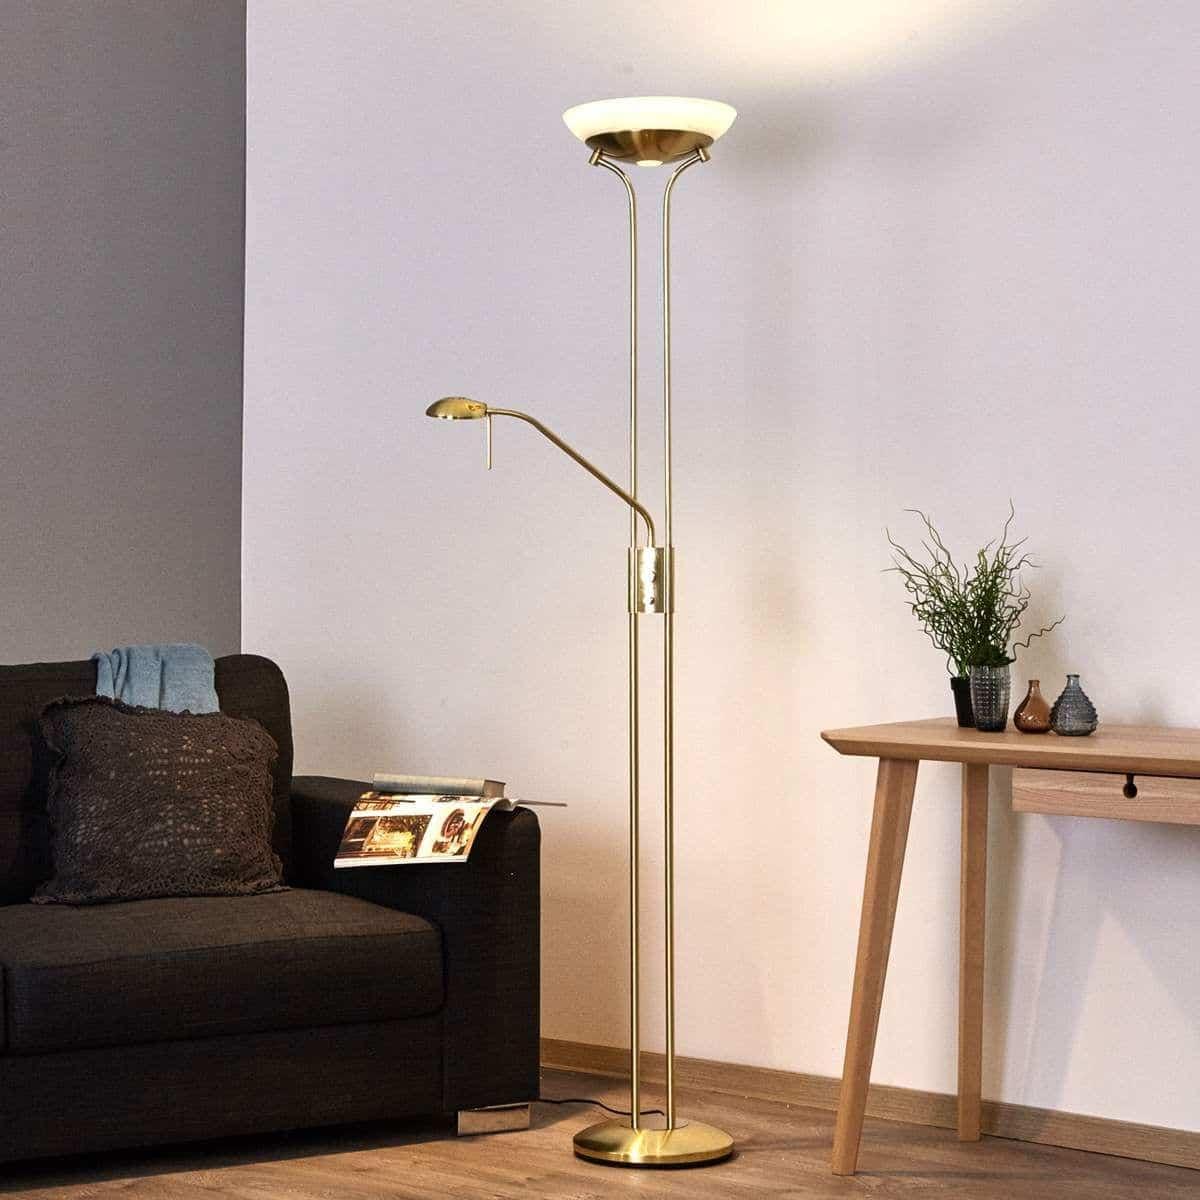 lampadaire liseuse interieur design